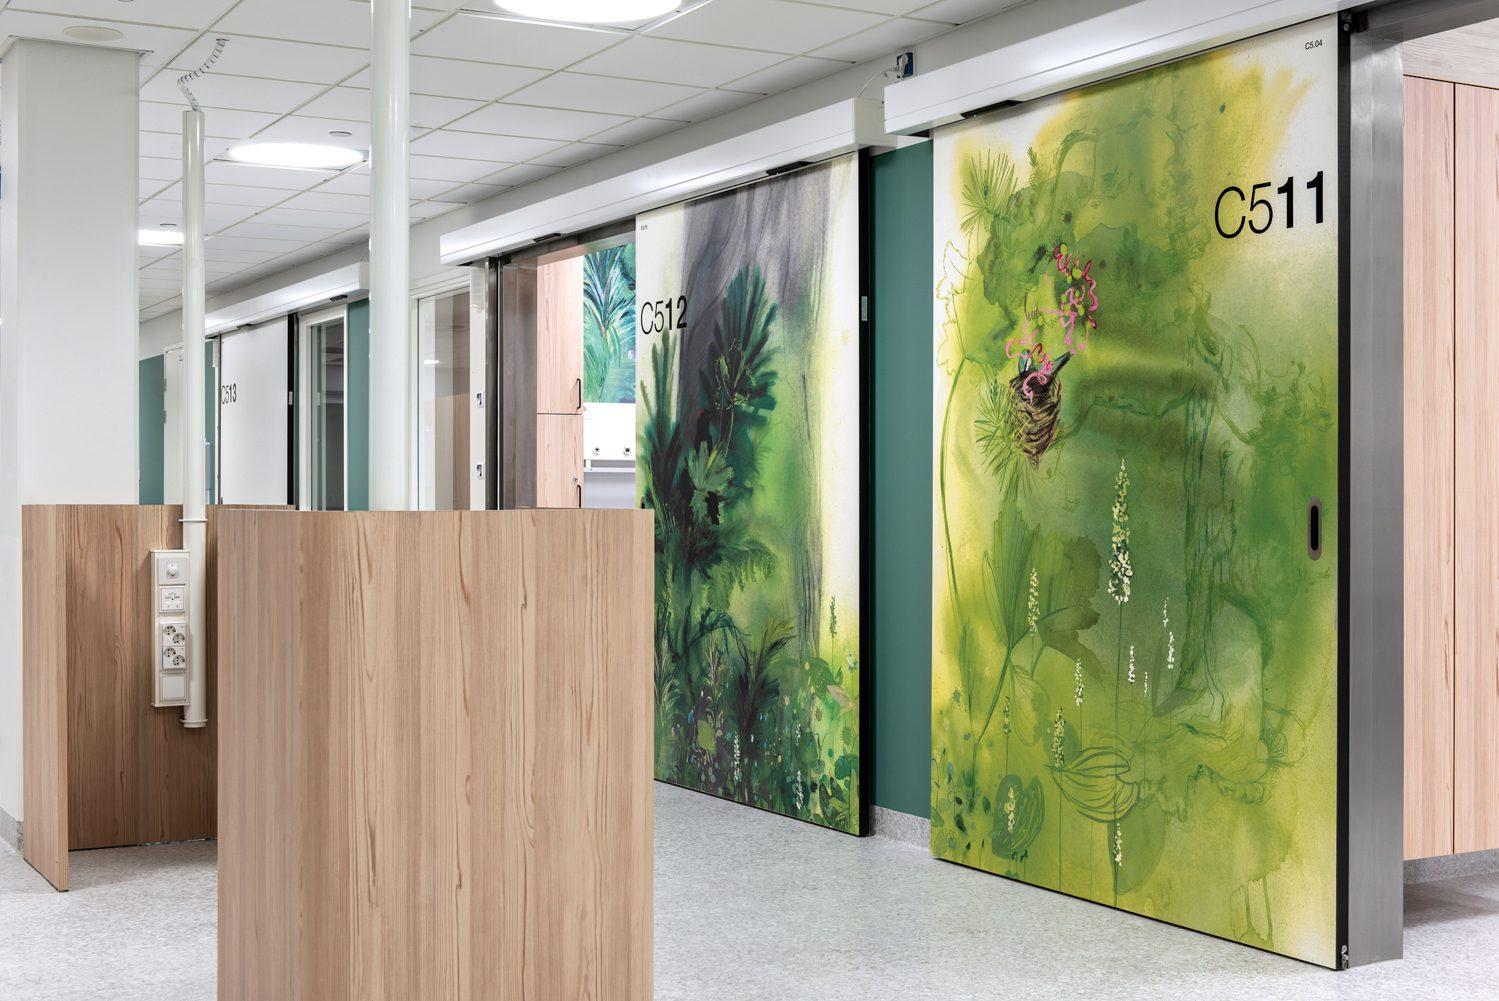 In the patient-room ward, sliding doors hosting Kati Immonen artwork back nursing stations in laminated wood. Photography: Pauliina Salonen.